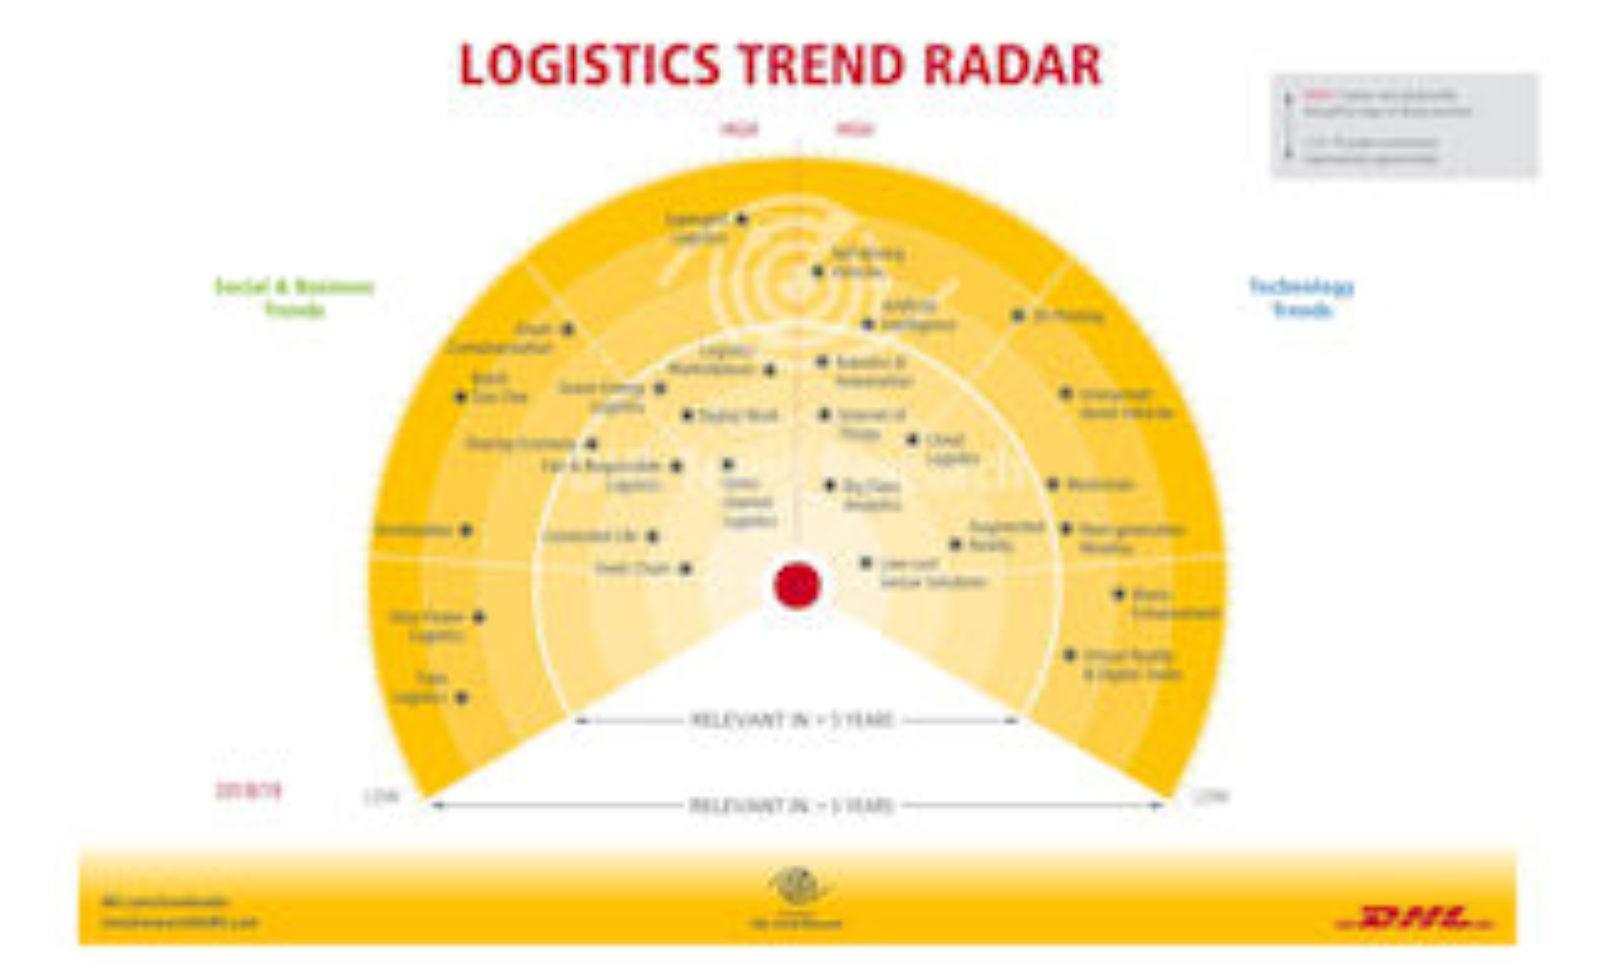 DHL: Neuer Logistics Trend Radar 2018/19